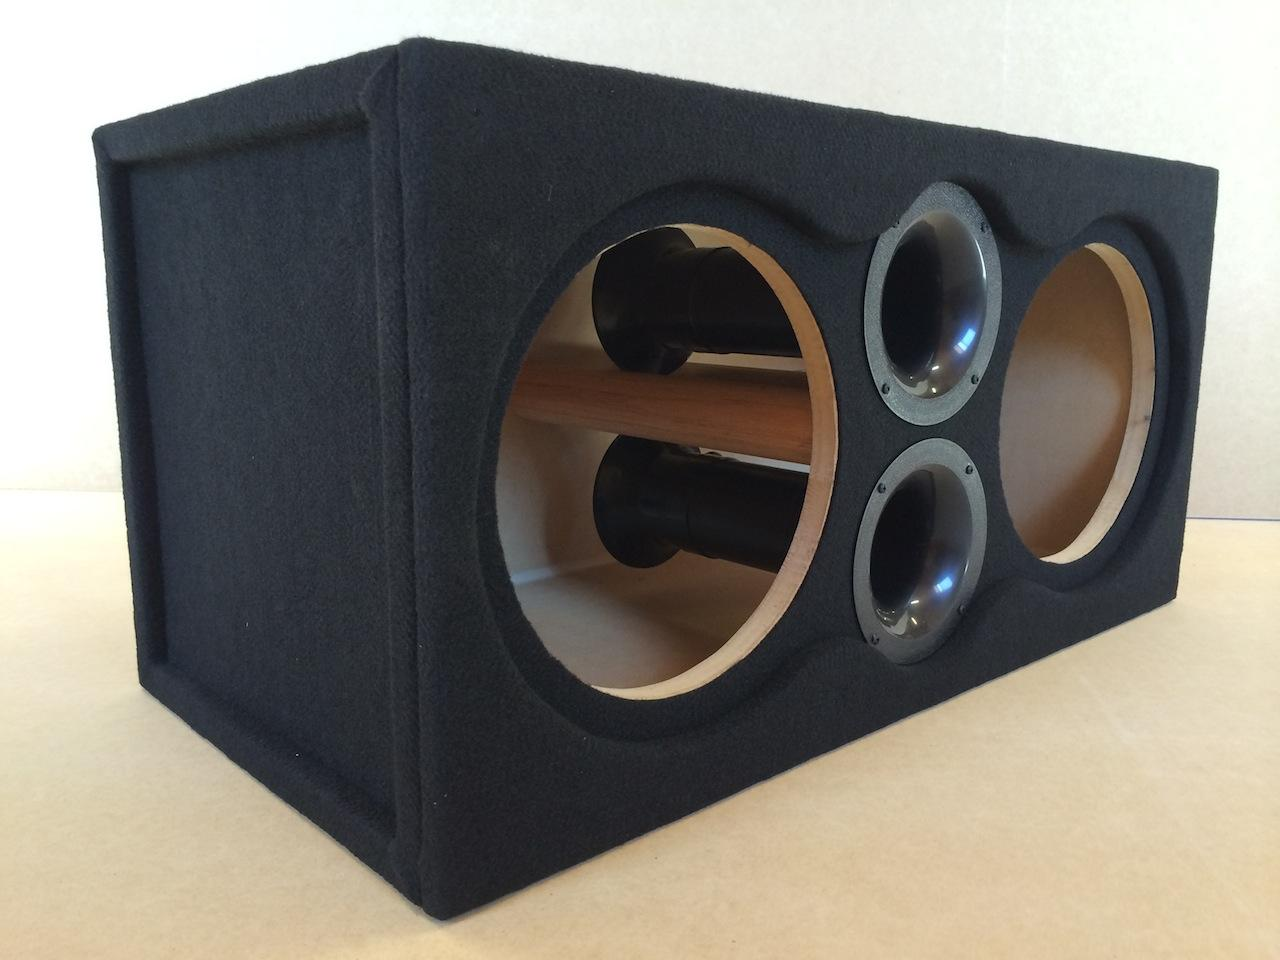 Custom Ported Subwoofer Enclosure Sub Box For 2 10 Jl Audio 10w6 Xd Acs60 6 Gauge Amplifier Amp Wire Installation Kit Speaker Cougar